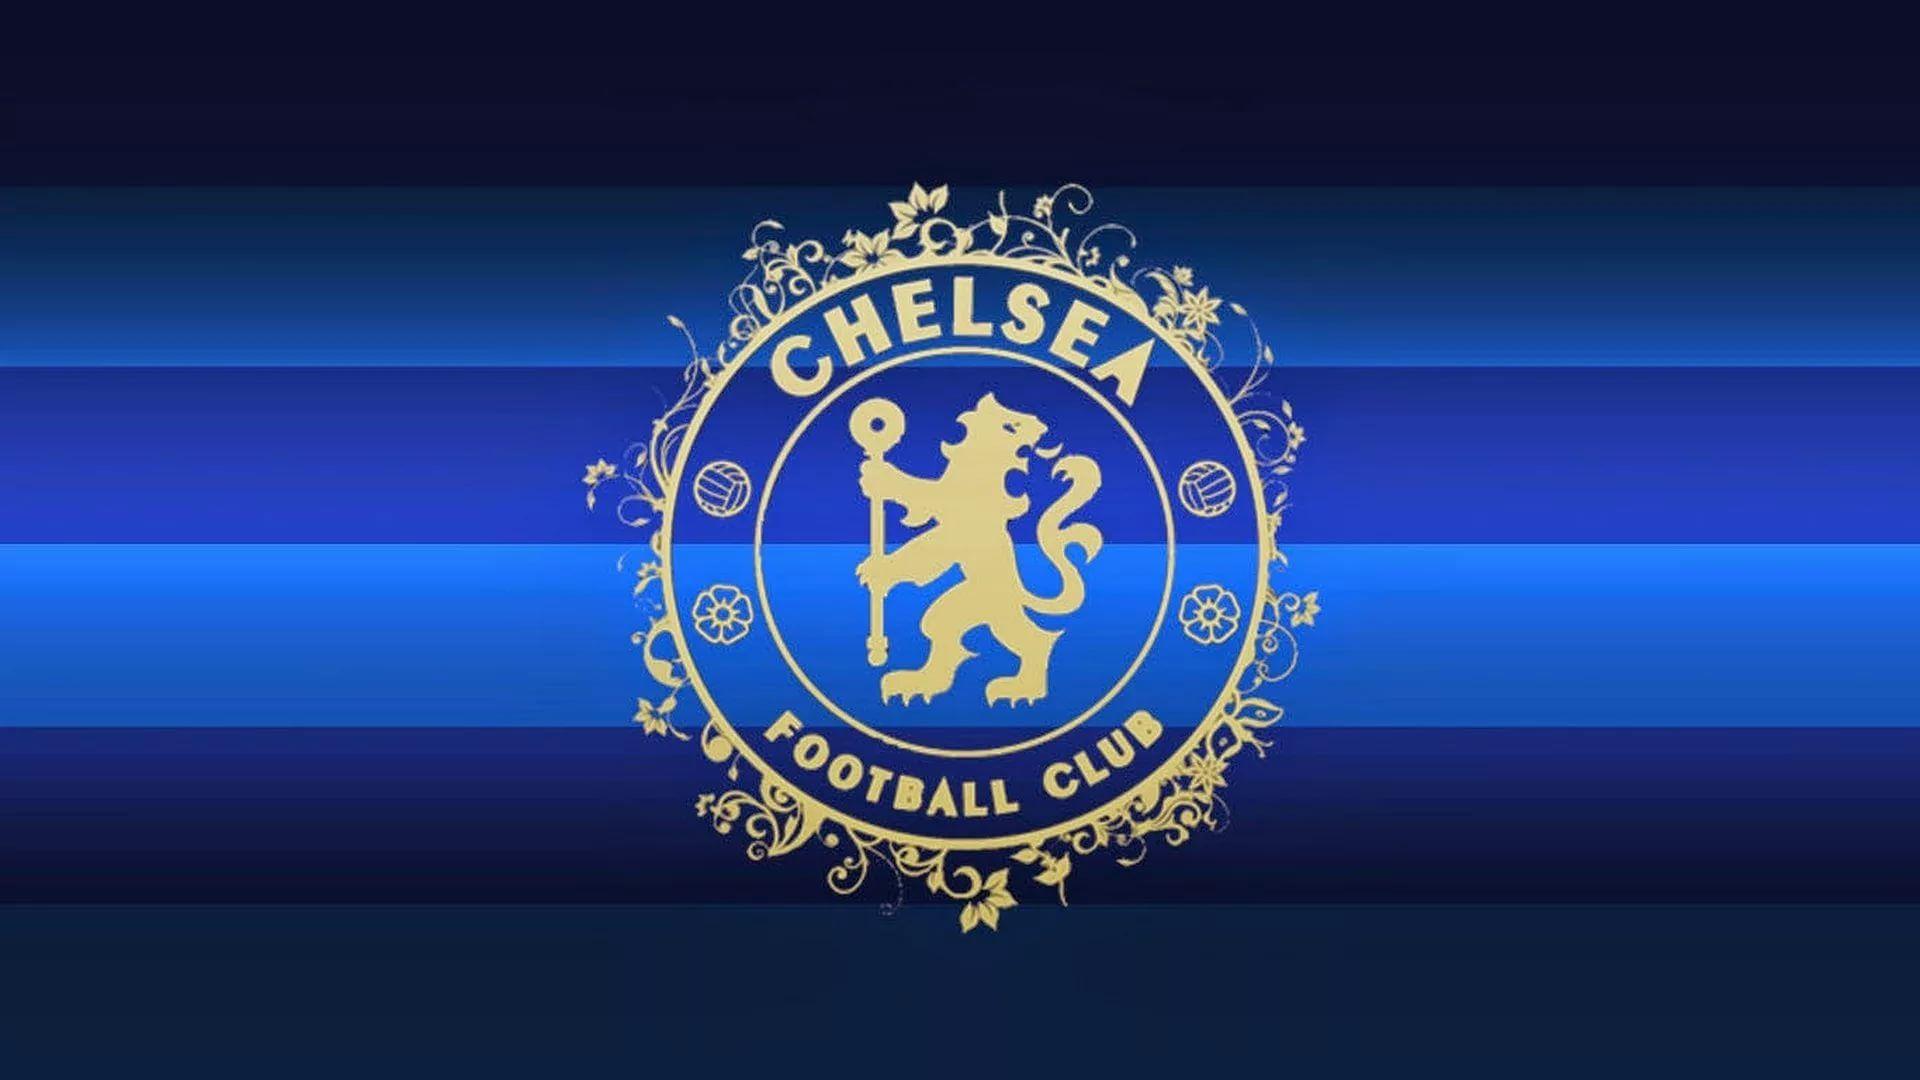 Chelsea background wallpaper